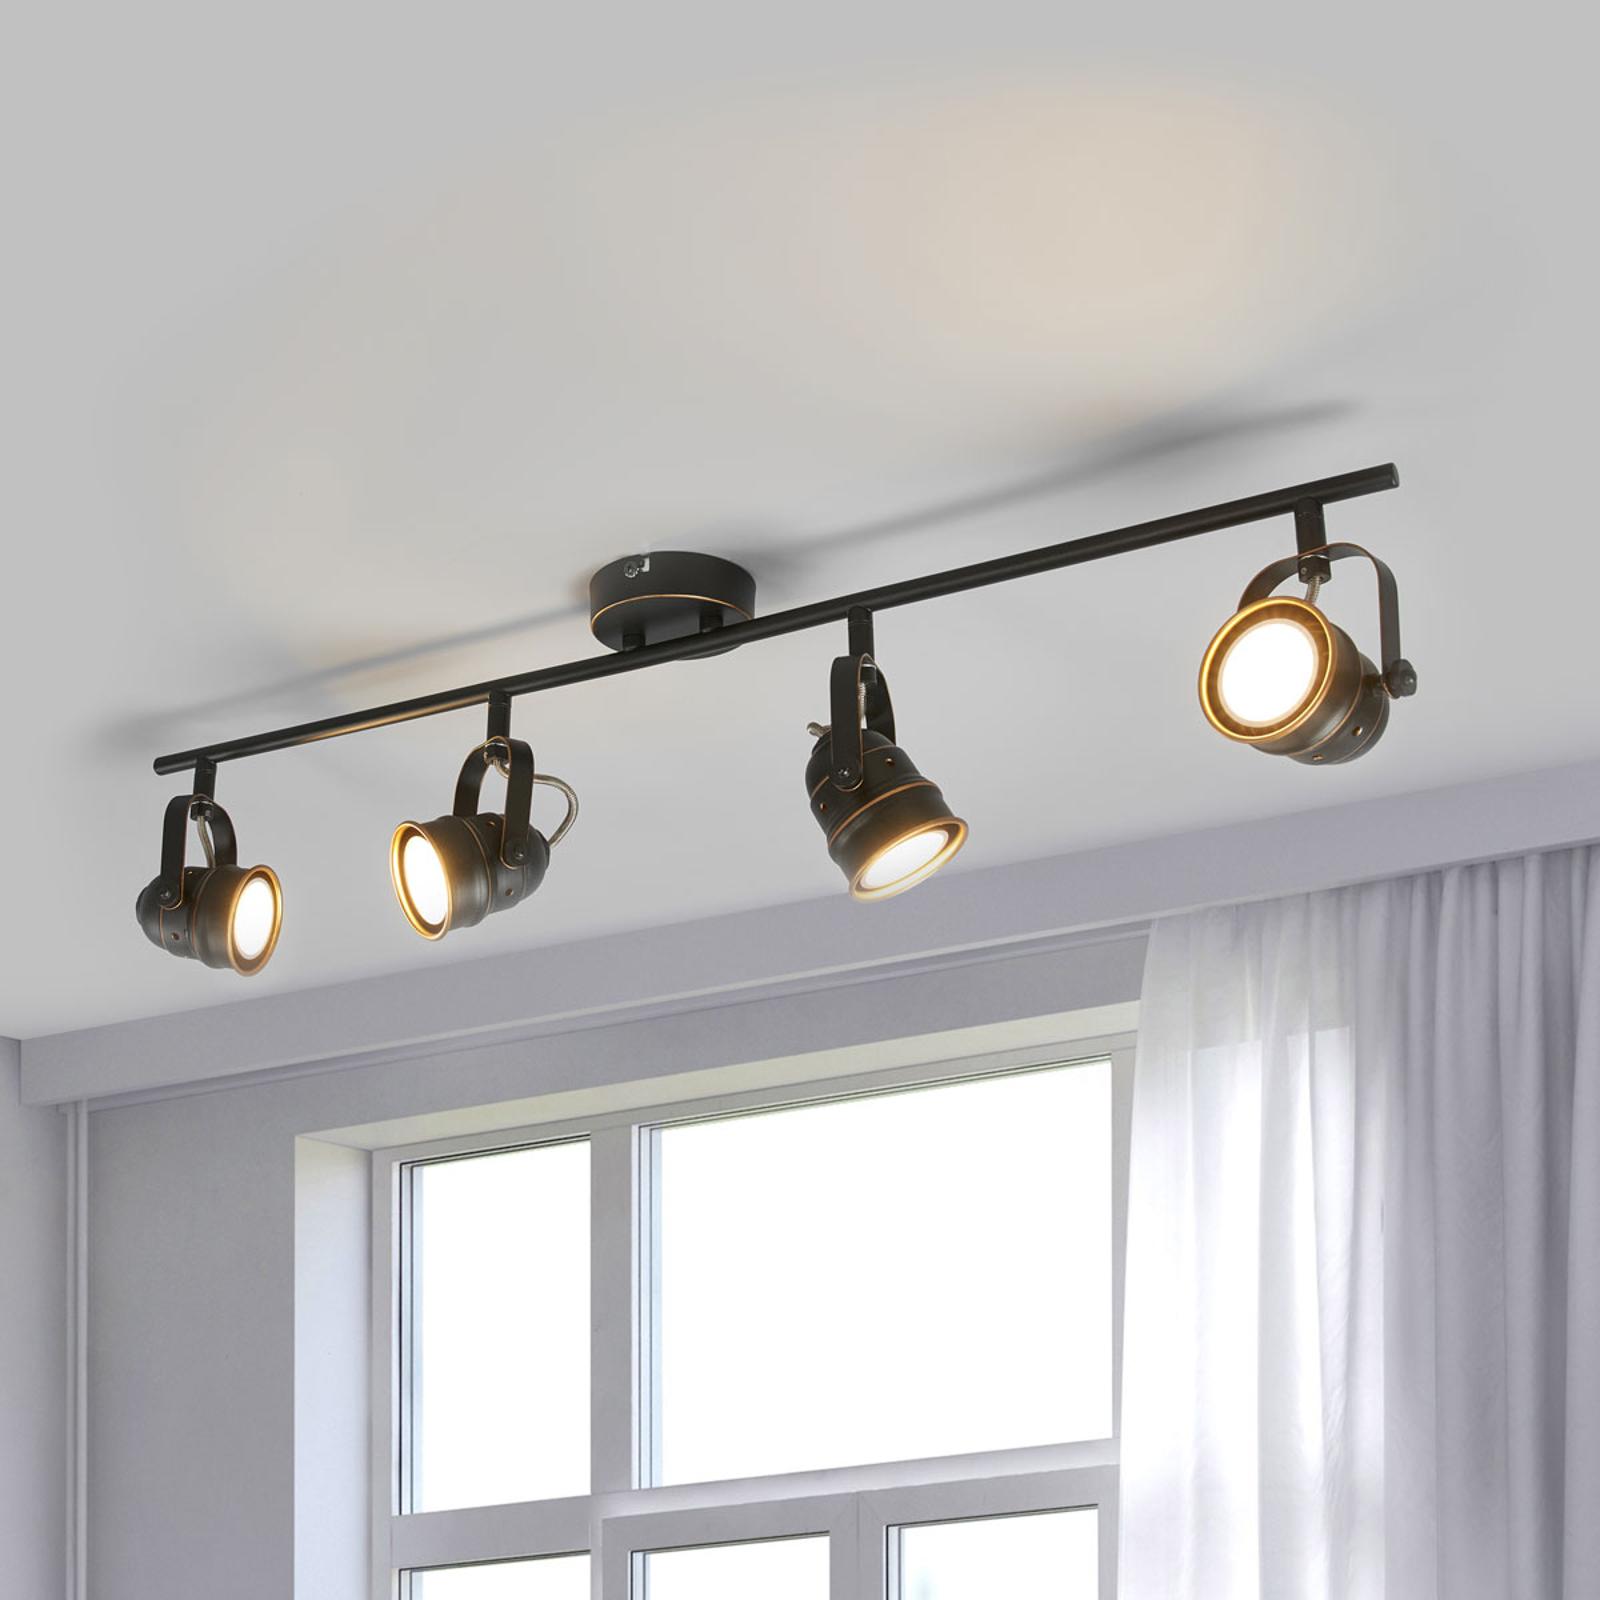 LED-taklampe Leonor, svart-gull, fire lys